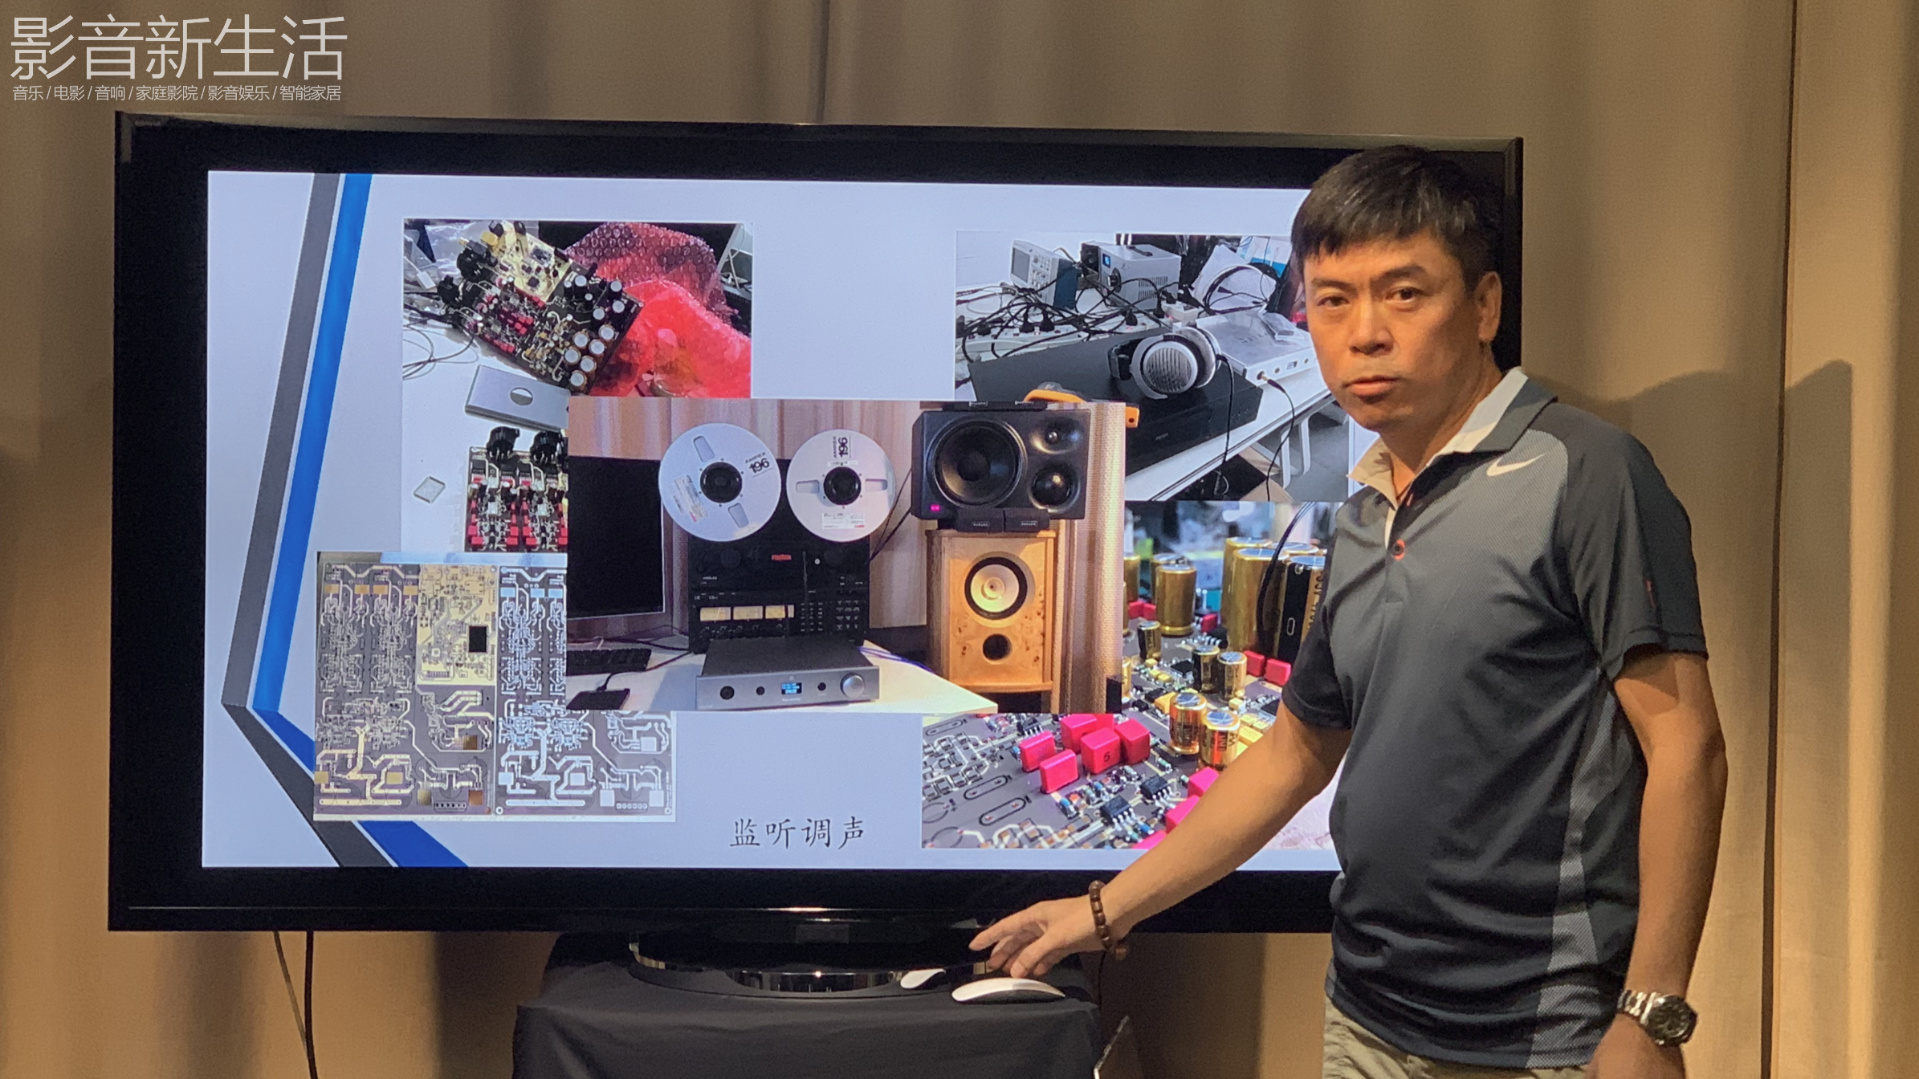 Pureaudio AirDSD HIFI 20 - 新品 | 2018柏韵10周年纪念产品:Pureaudio AirDSD音频流播放解码器发布!